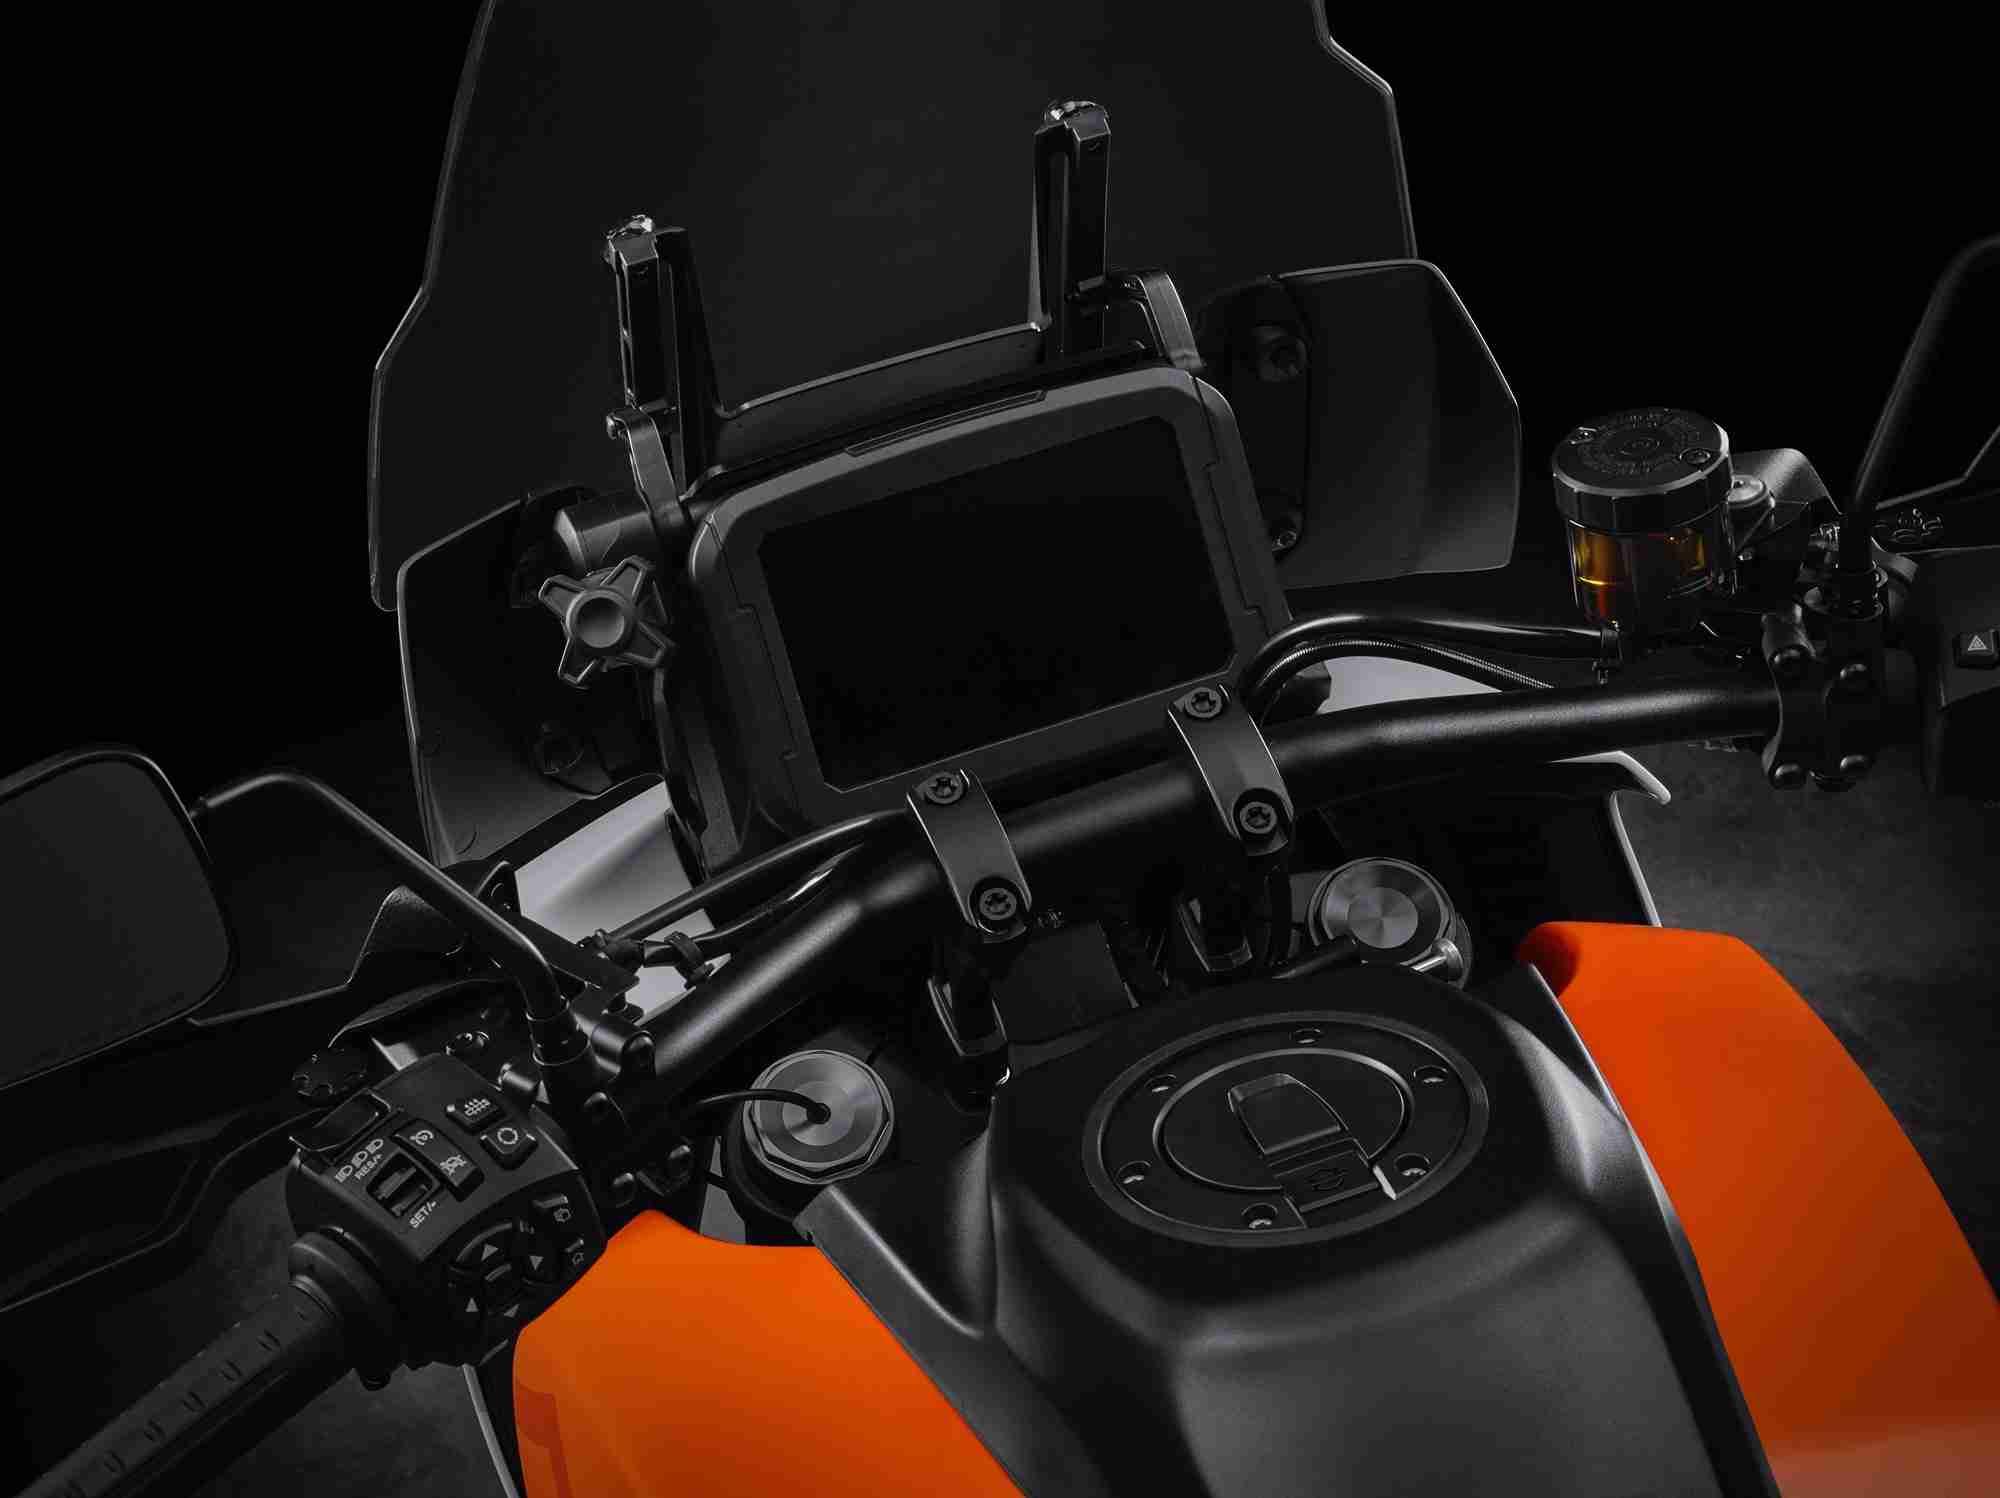 Harley-Davidson-Pan-America-switch-gear-